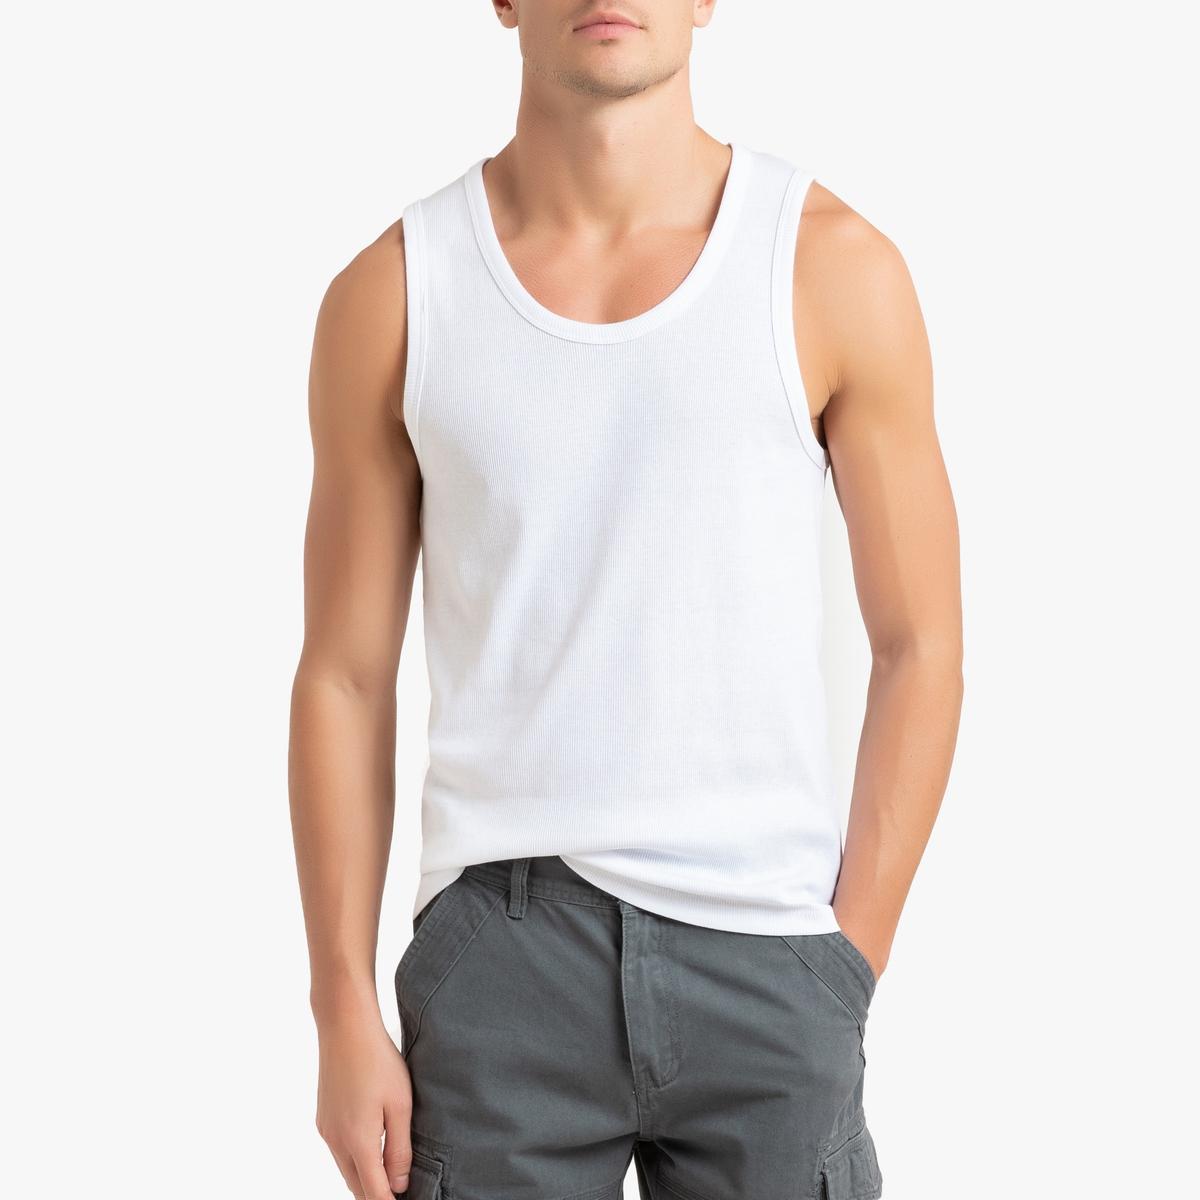 Camiseta sin mangas de canalé, Théo